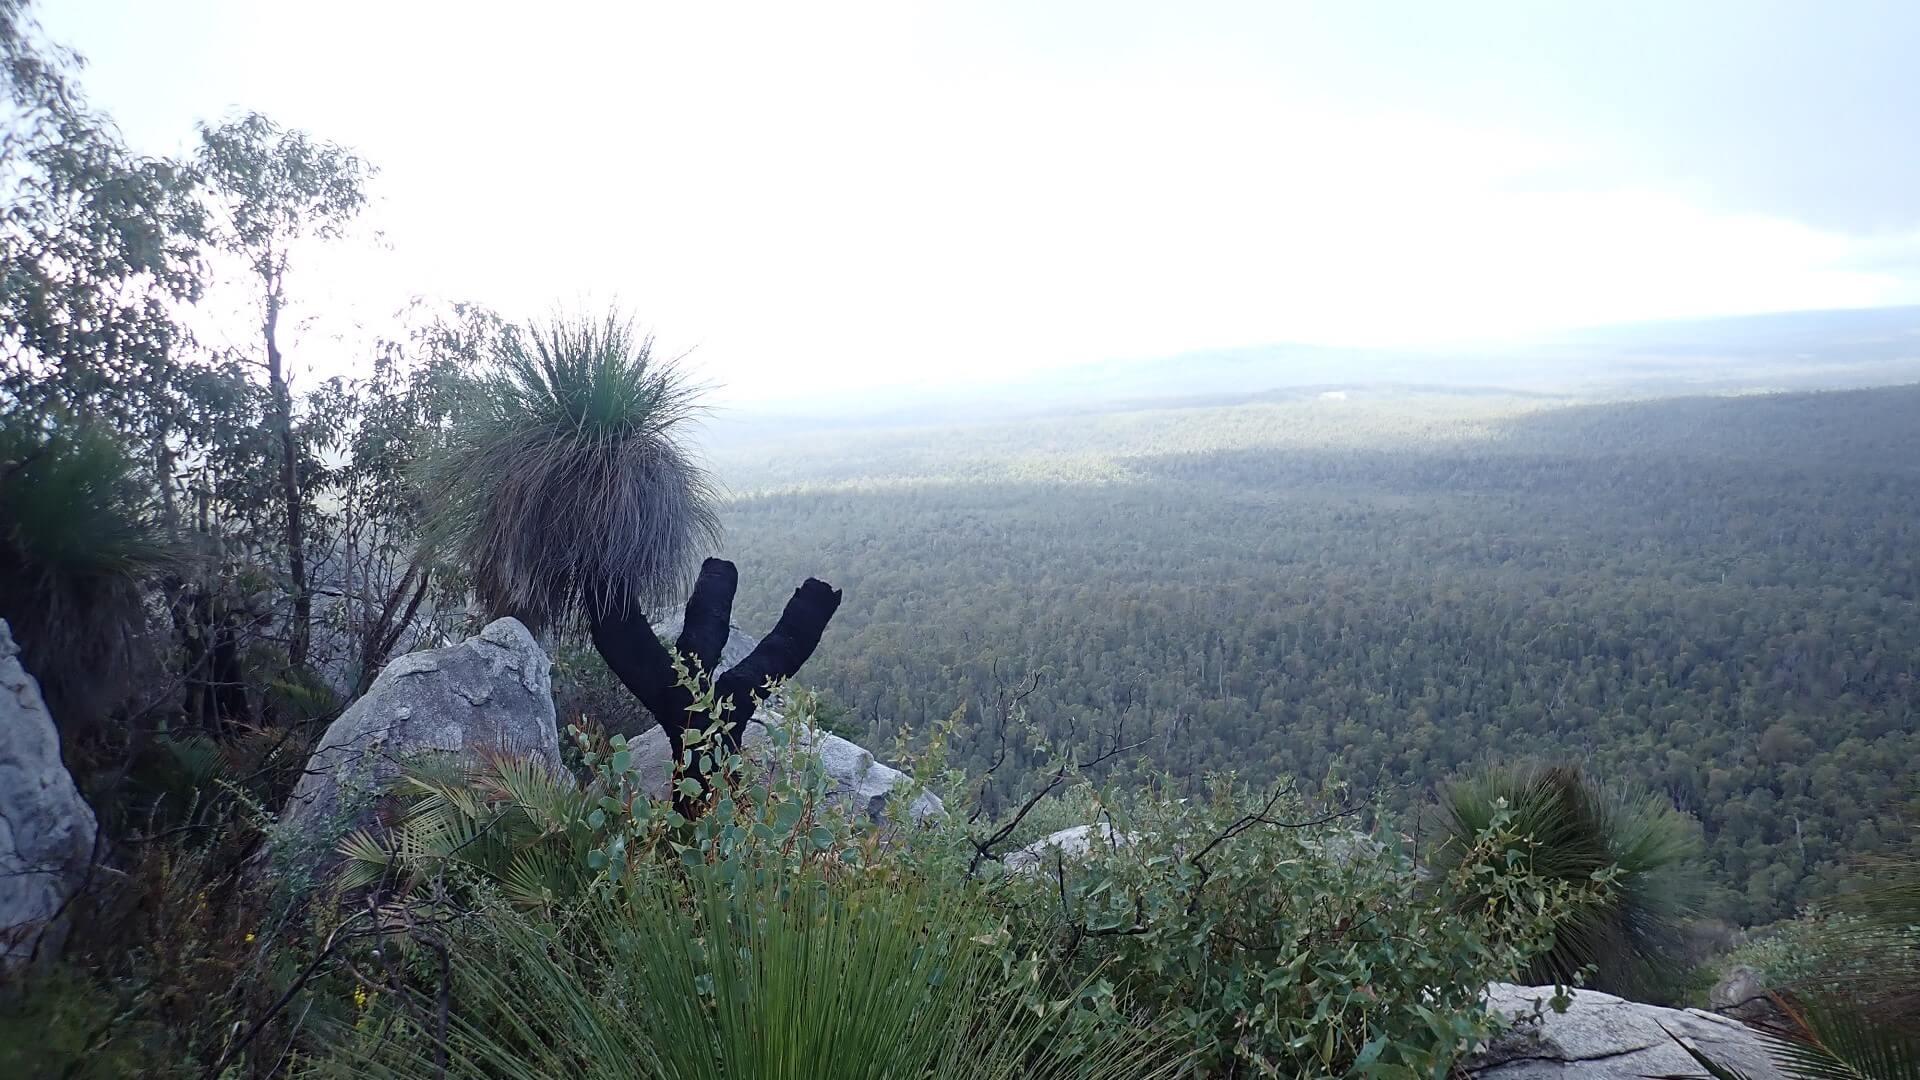 Valley views from Mt Cooke Bibbulmun Track